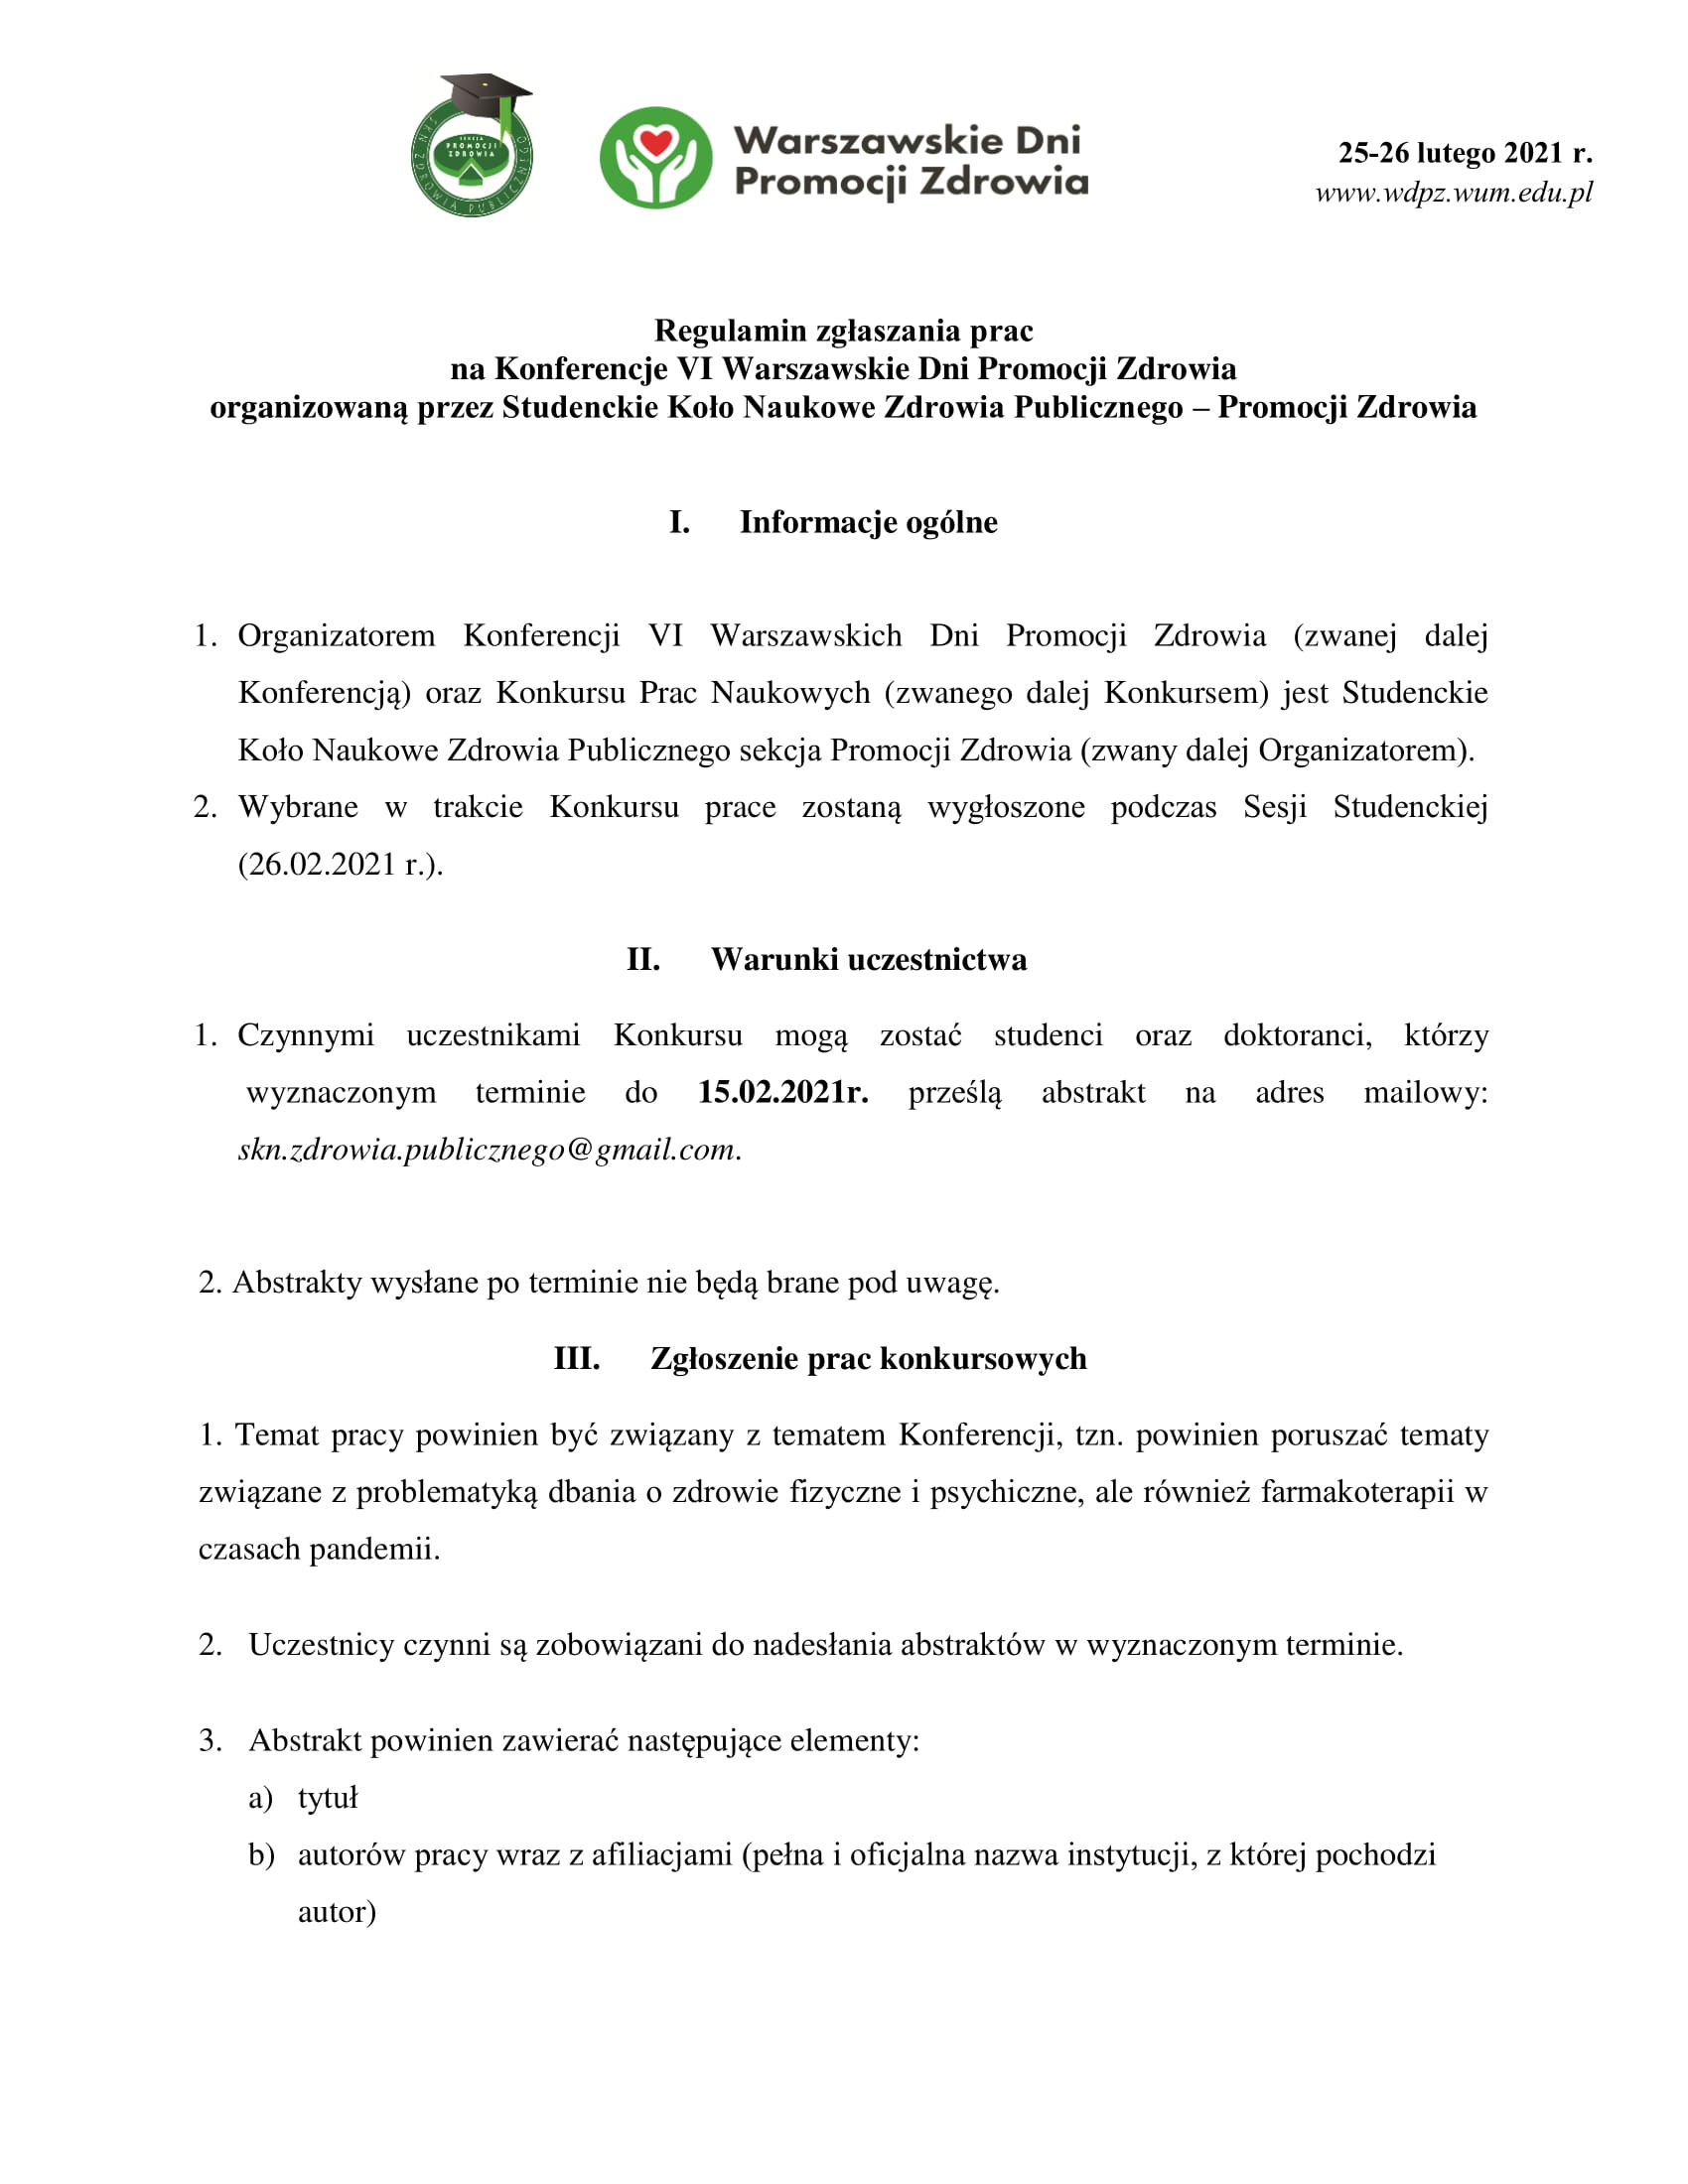 regulamin.VI-WDPZ (1)-1